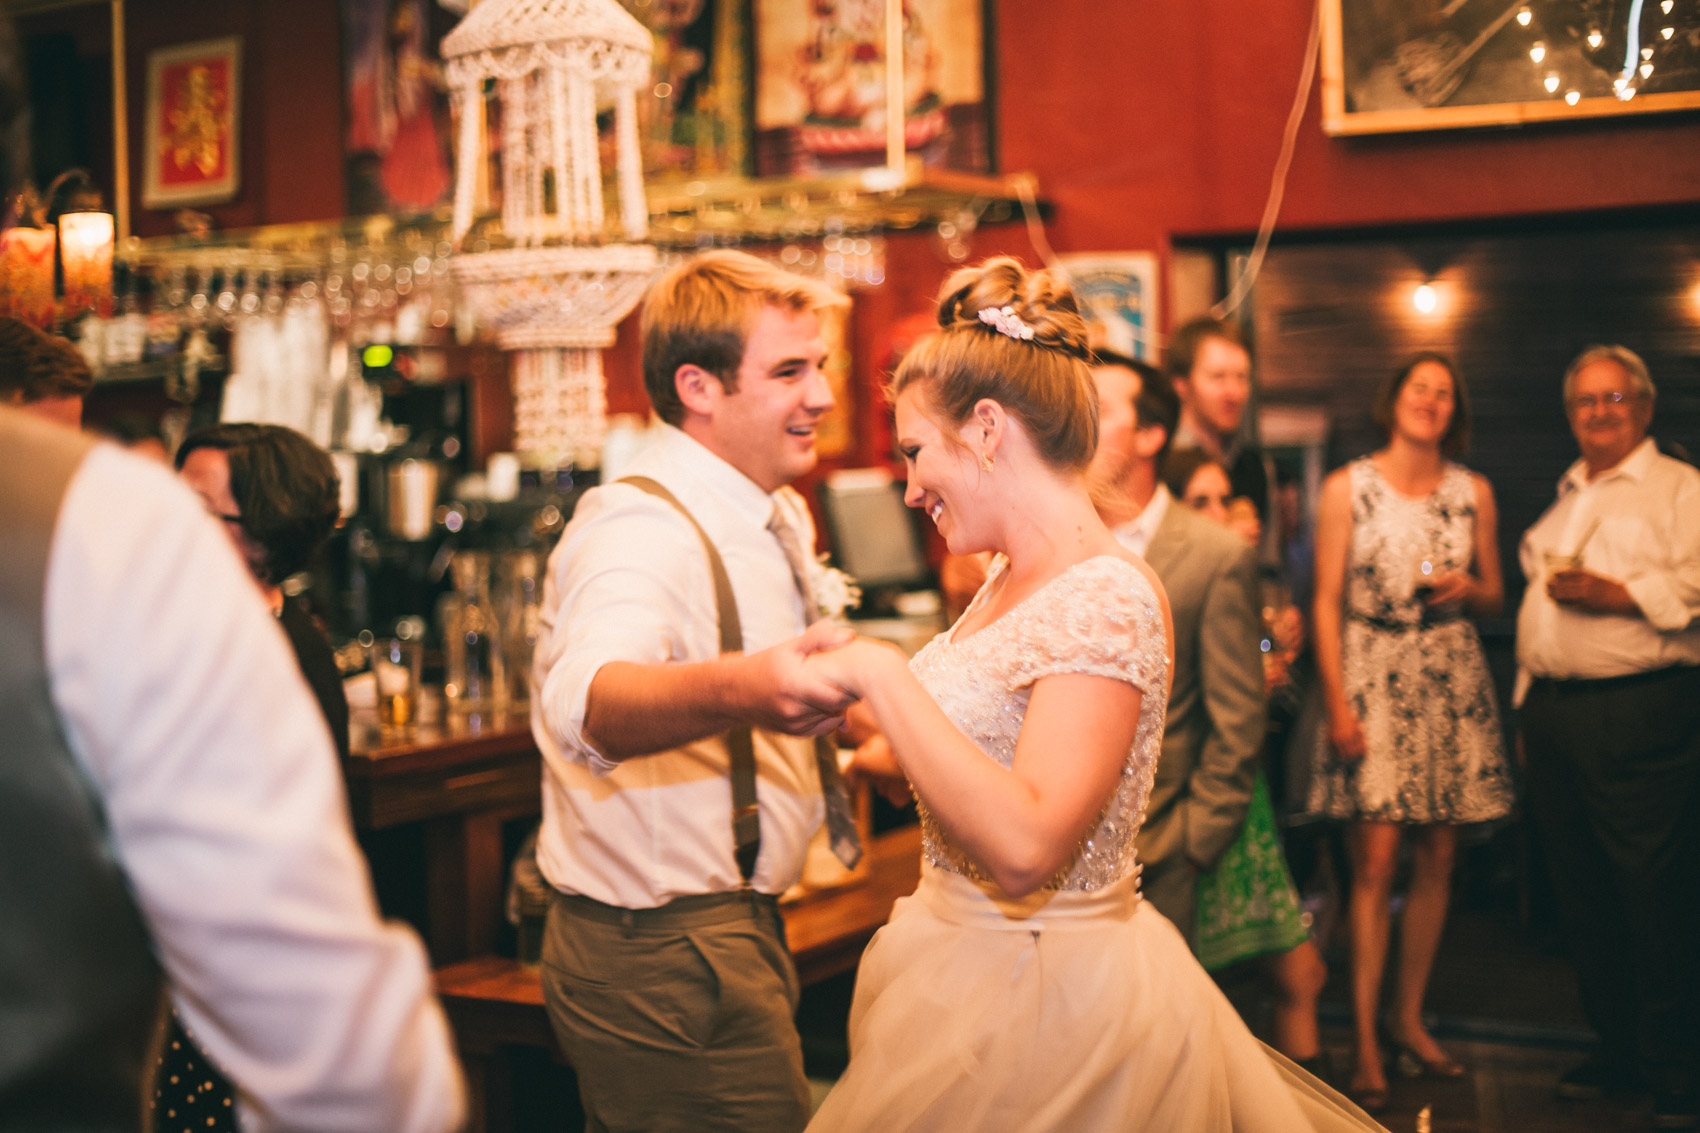 054_Crested Butte Wedding Photographer Secret Stash Woods Walk Ceremony Jamie Blue Bird Events Boho Epic Stars